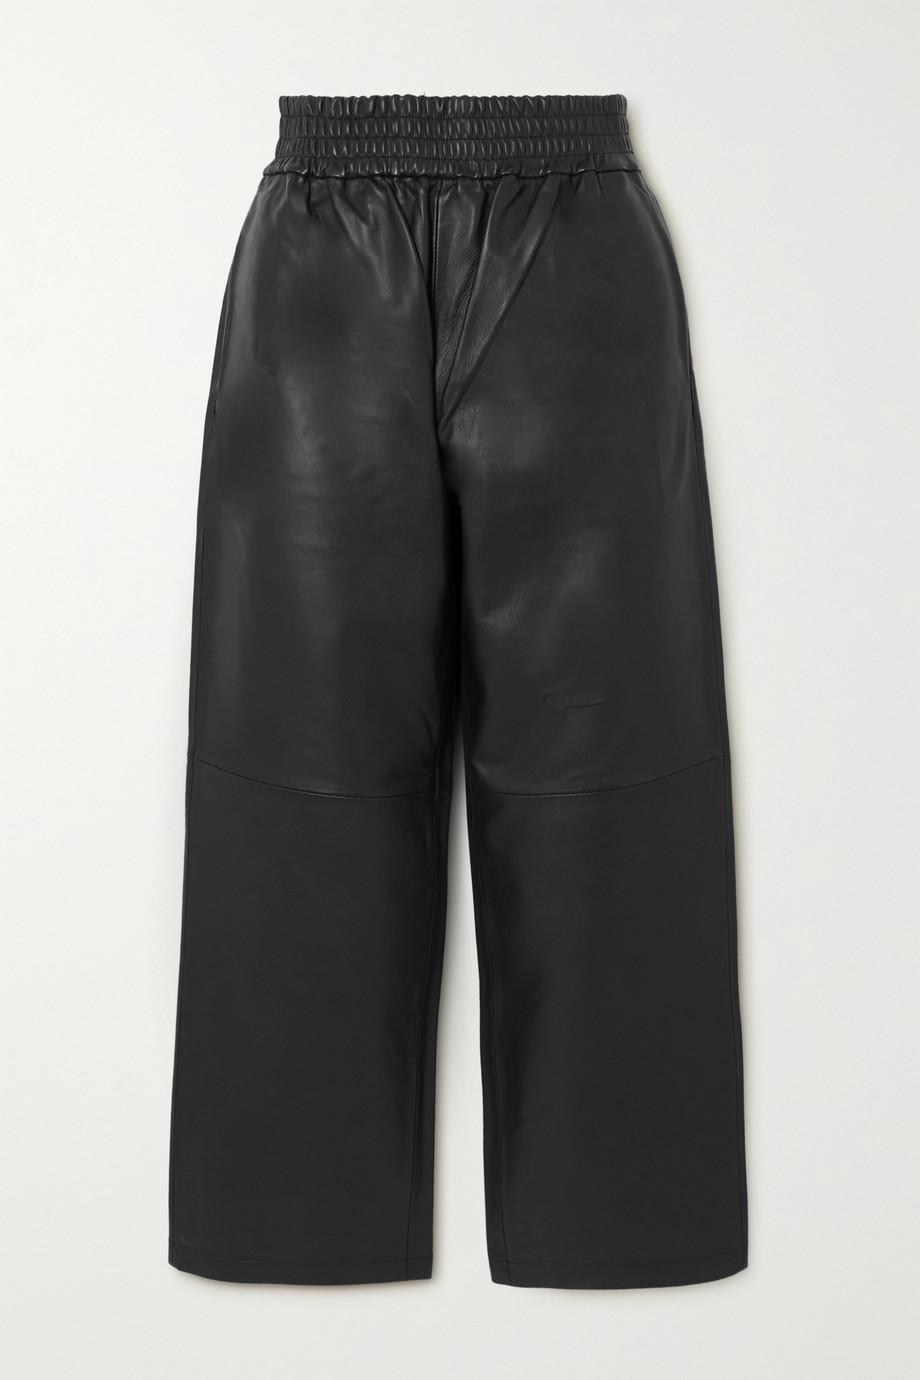 By Malene Birger Mizonia leather wide-leg pants